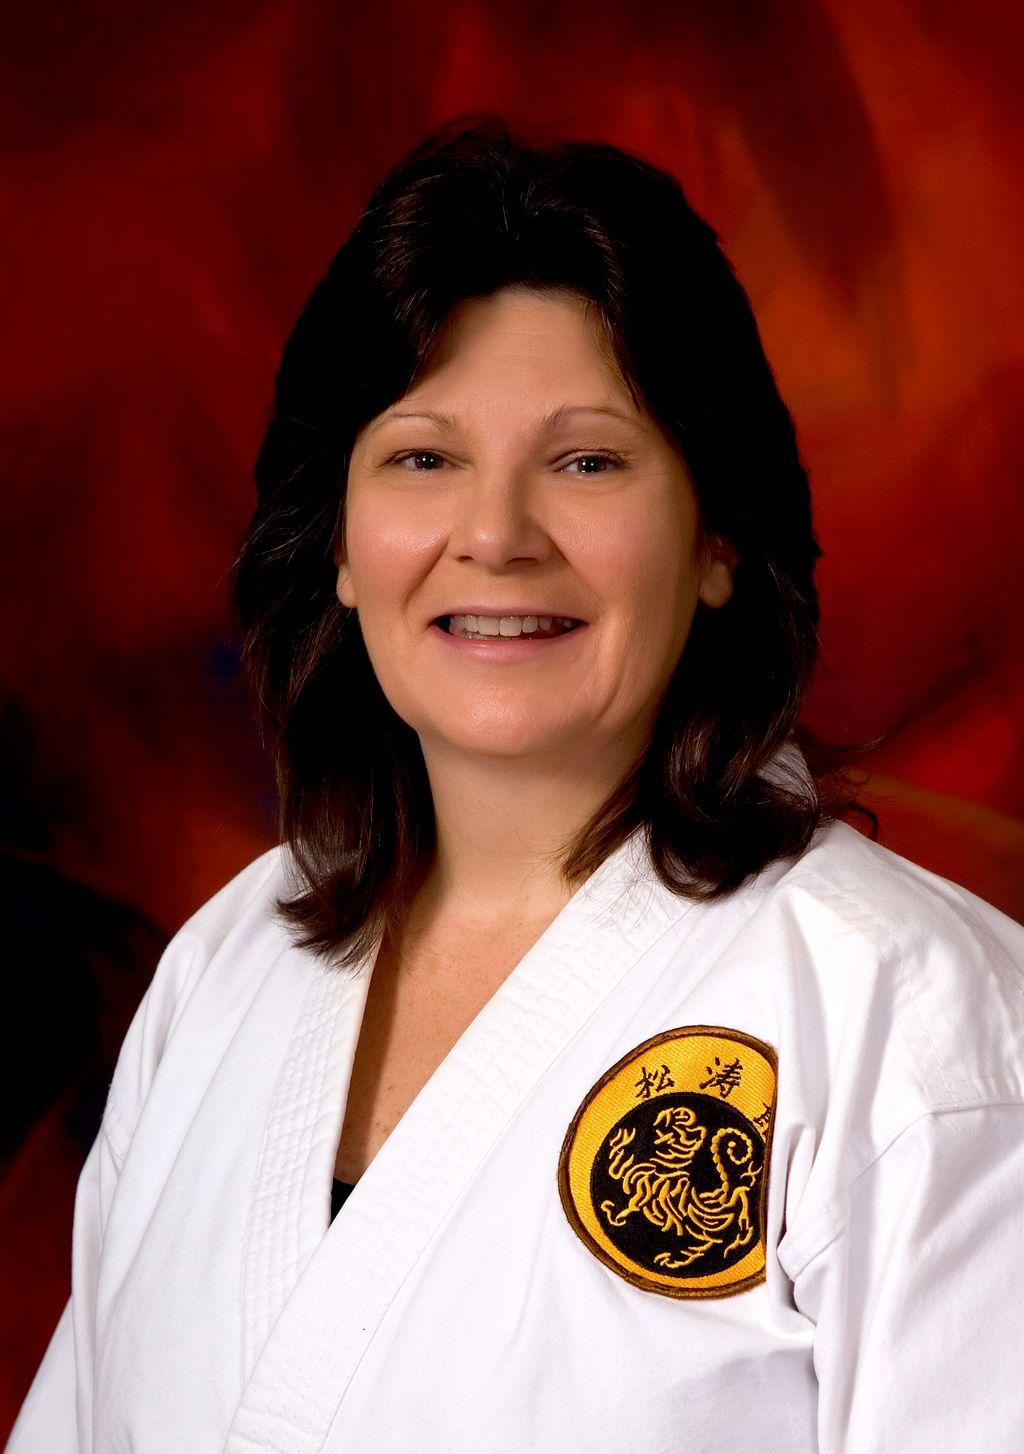 American Tiger Karate Academy